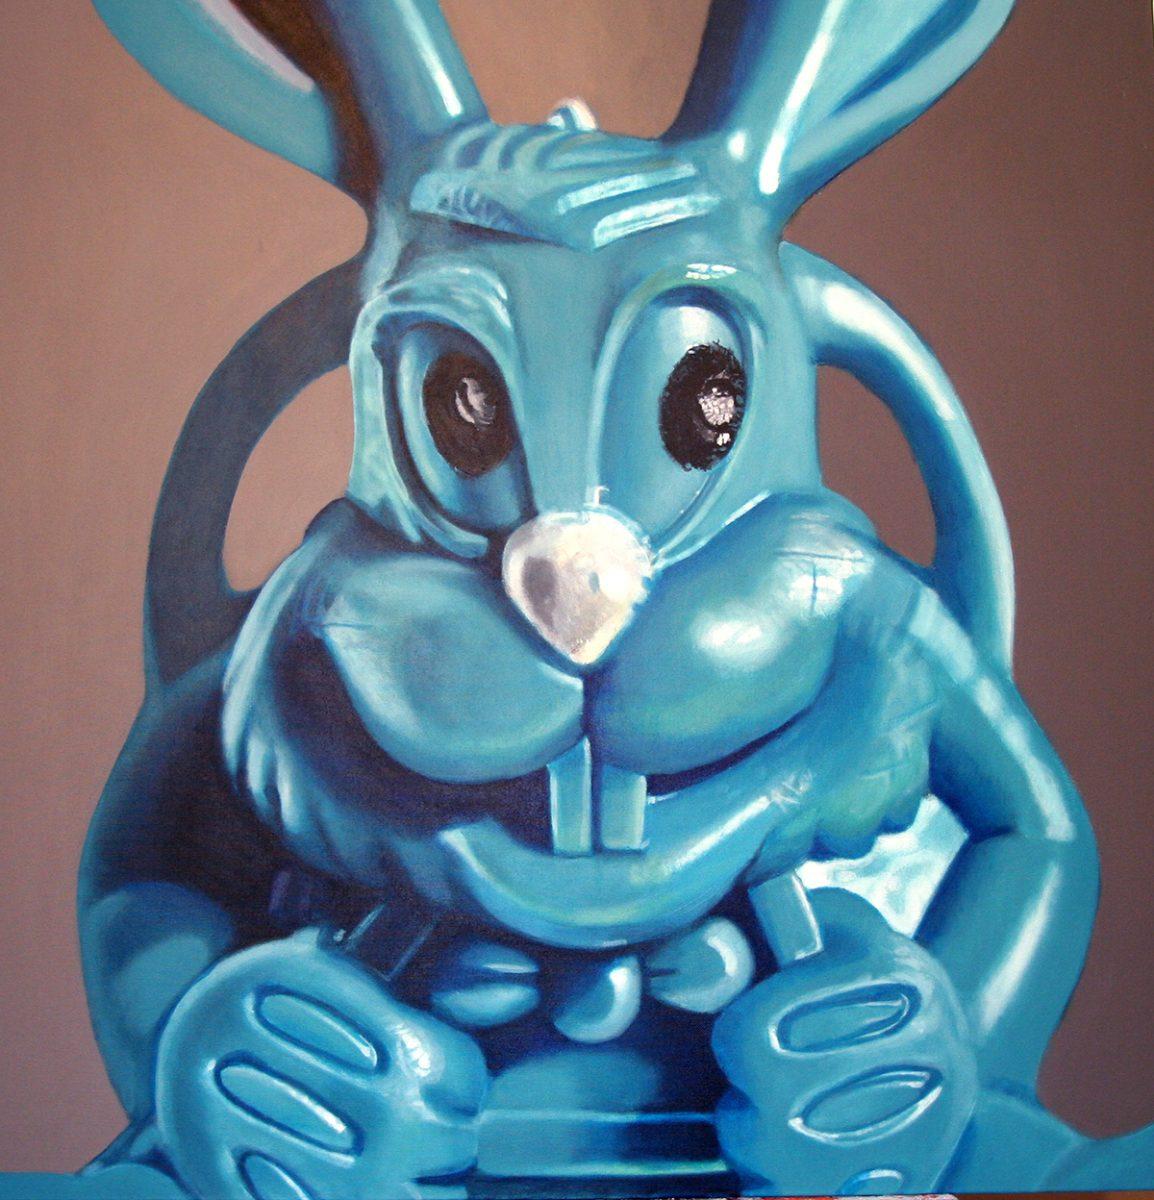 Paratrooper Bunny #2 (Blue)